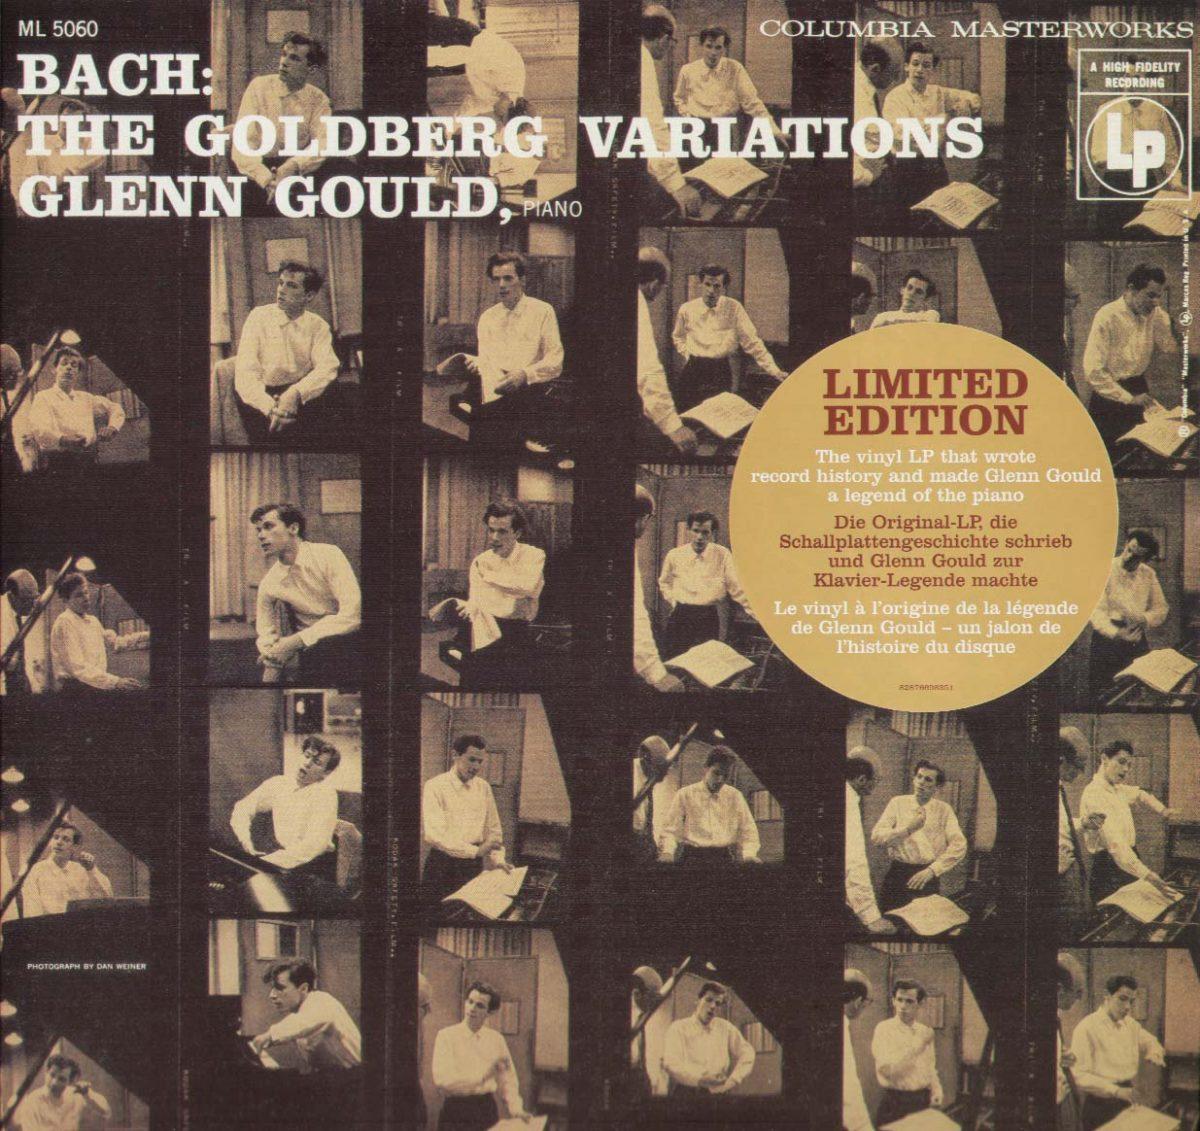 Glenn Gould, BACH Goldberg Variations